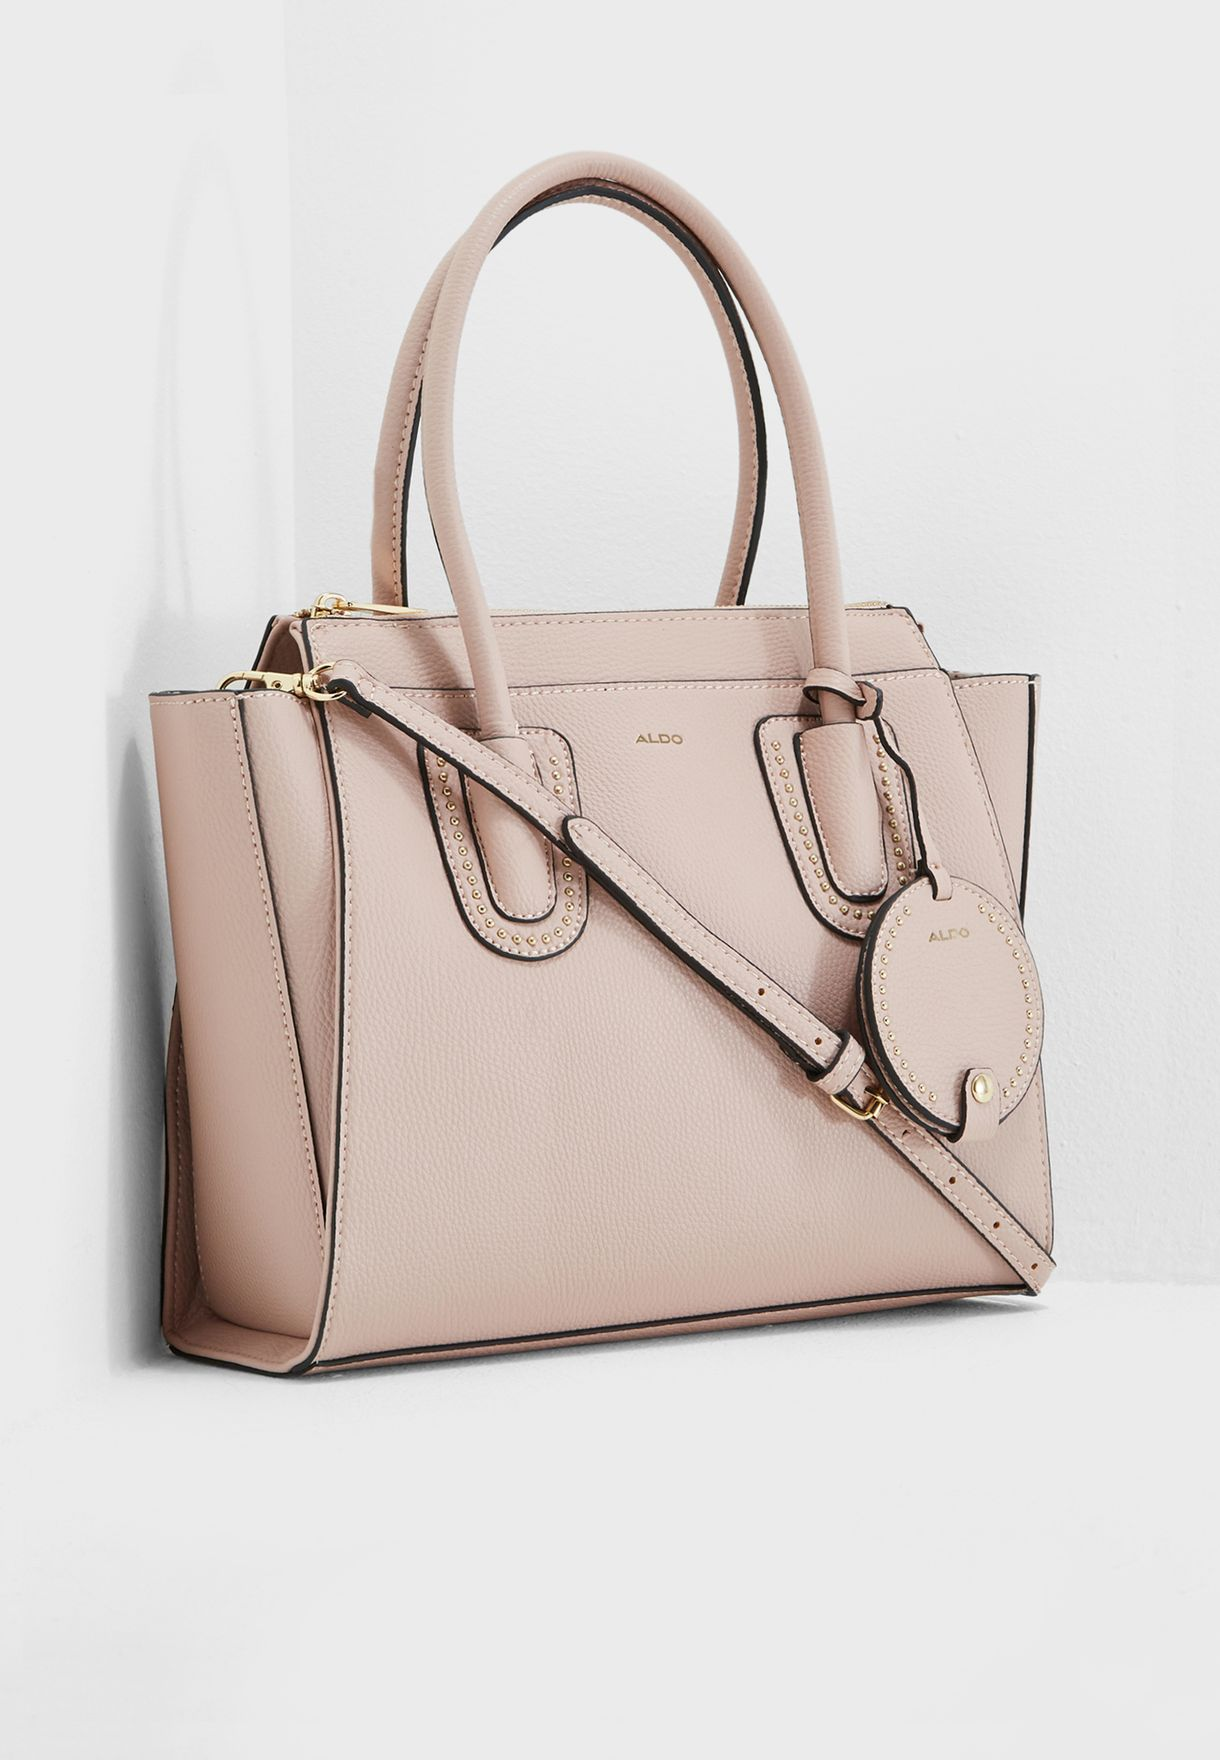 9a97d16c77d Shop Aldo pink Medium Miradode Tote MIRADODE55 for Women in UAE -  AL729AC49ZOO